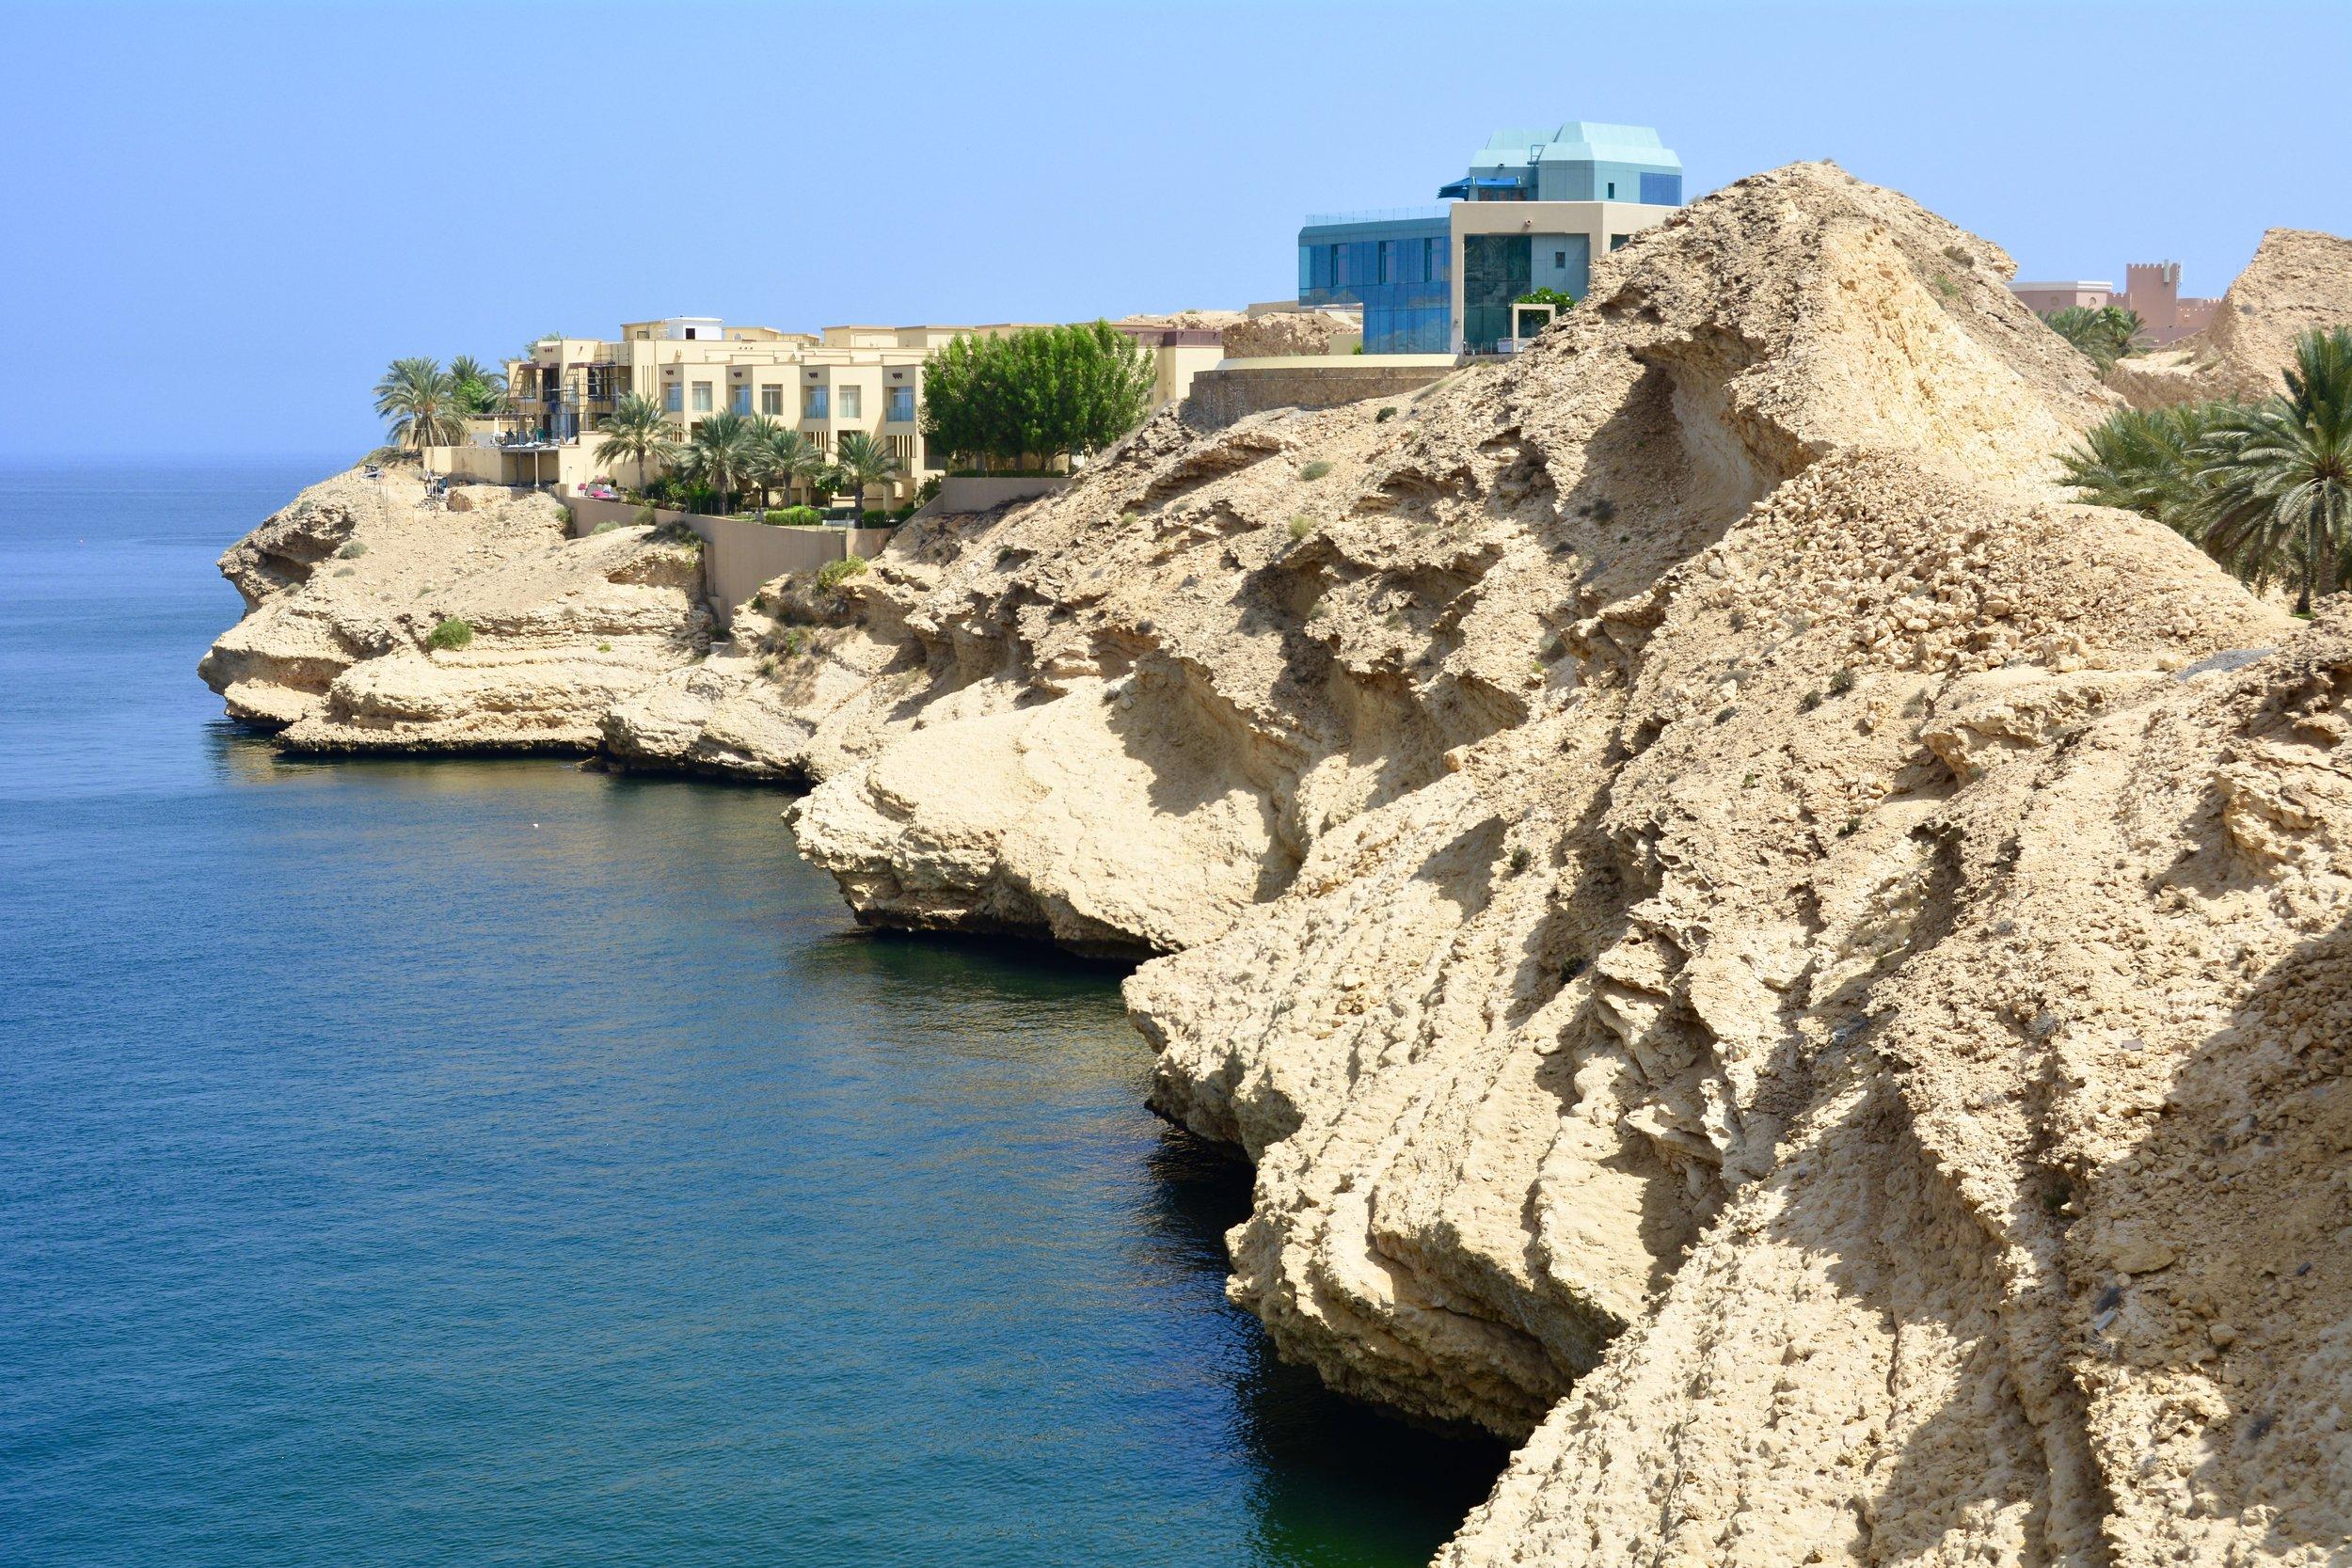 Cliff Top Villas (Shangri-La Muscat)